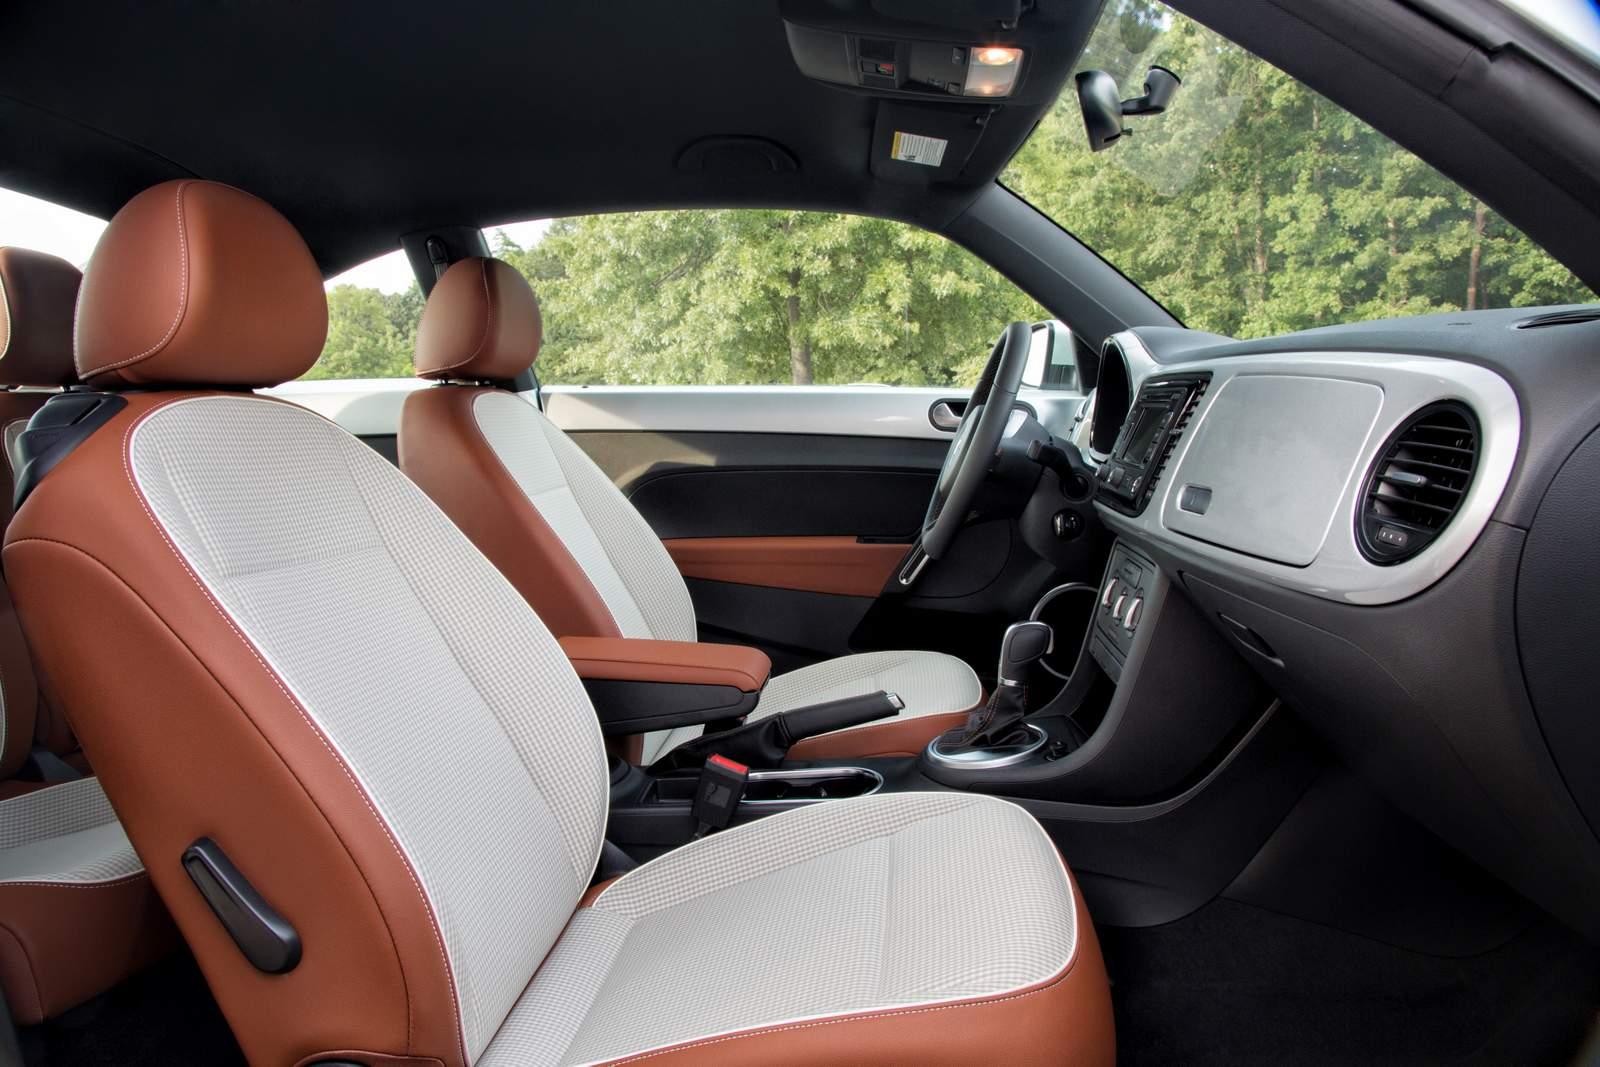 Volkswagen Beetle Classic Chega Aos Eua Pre O R Car Blog Br